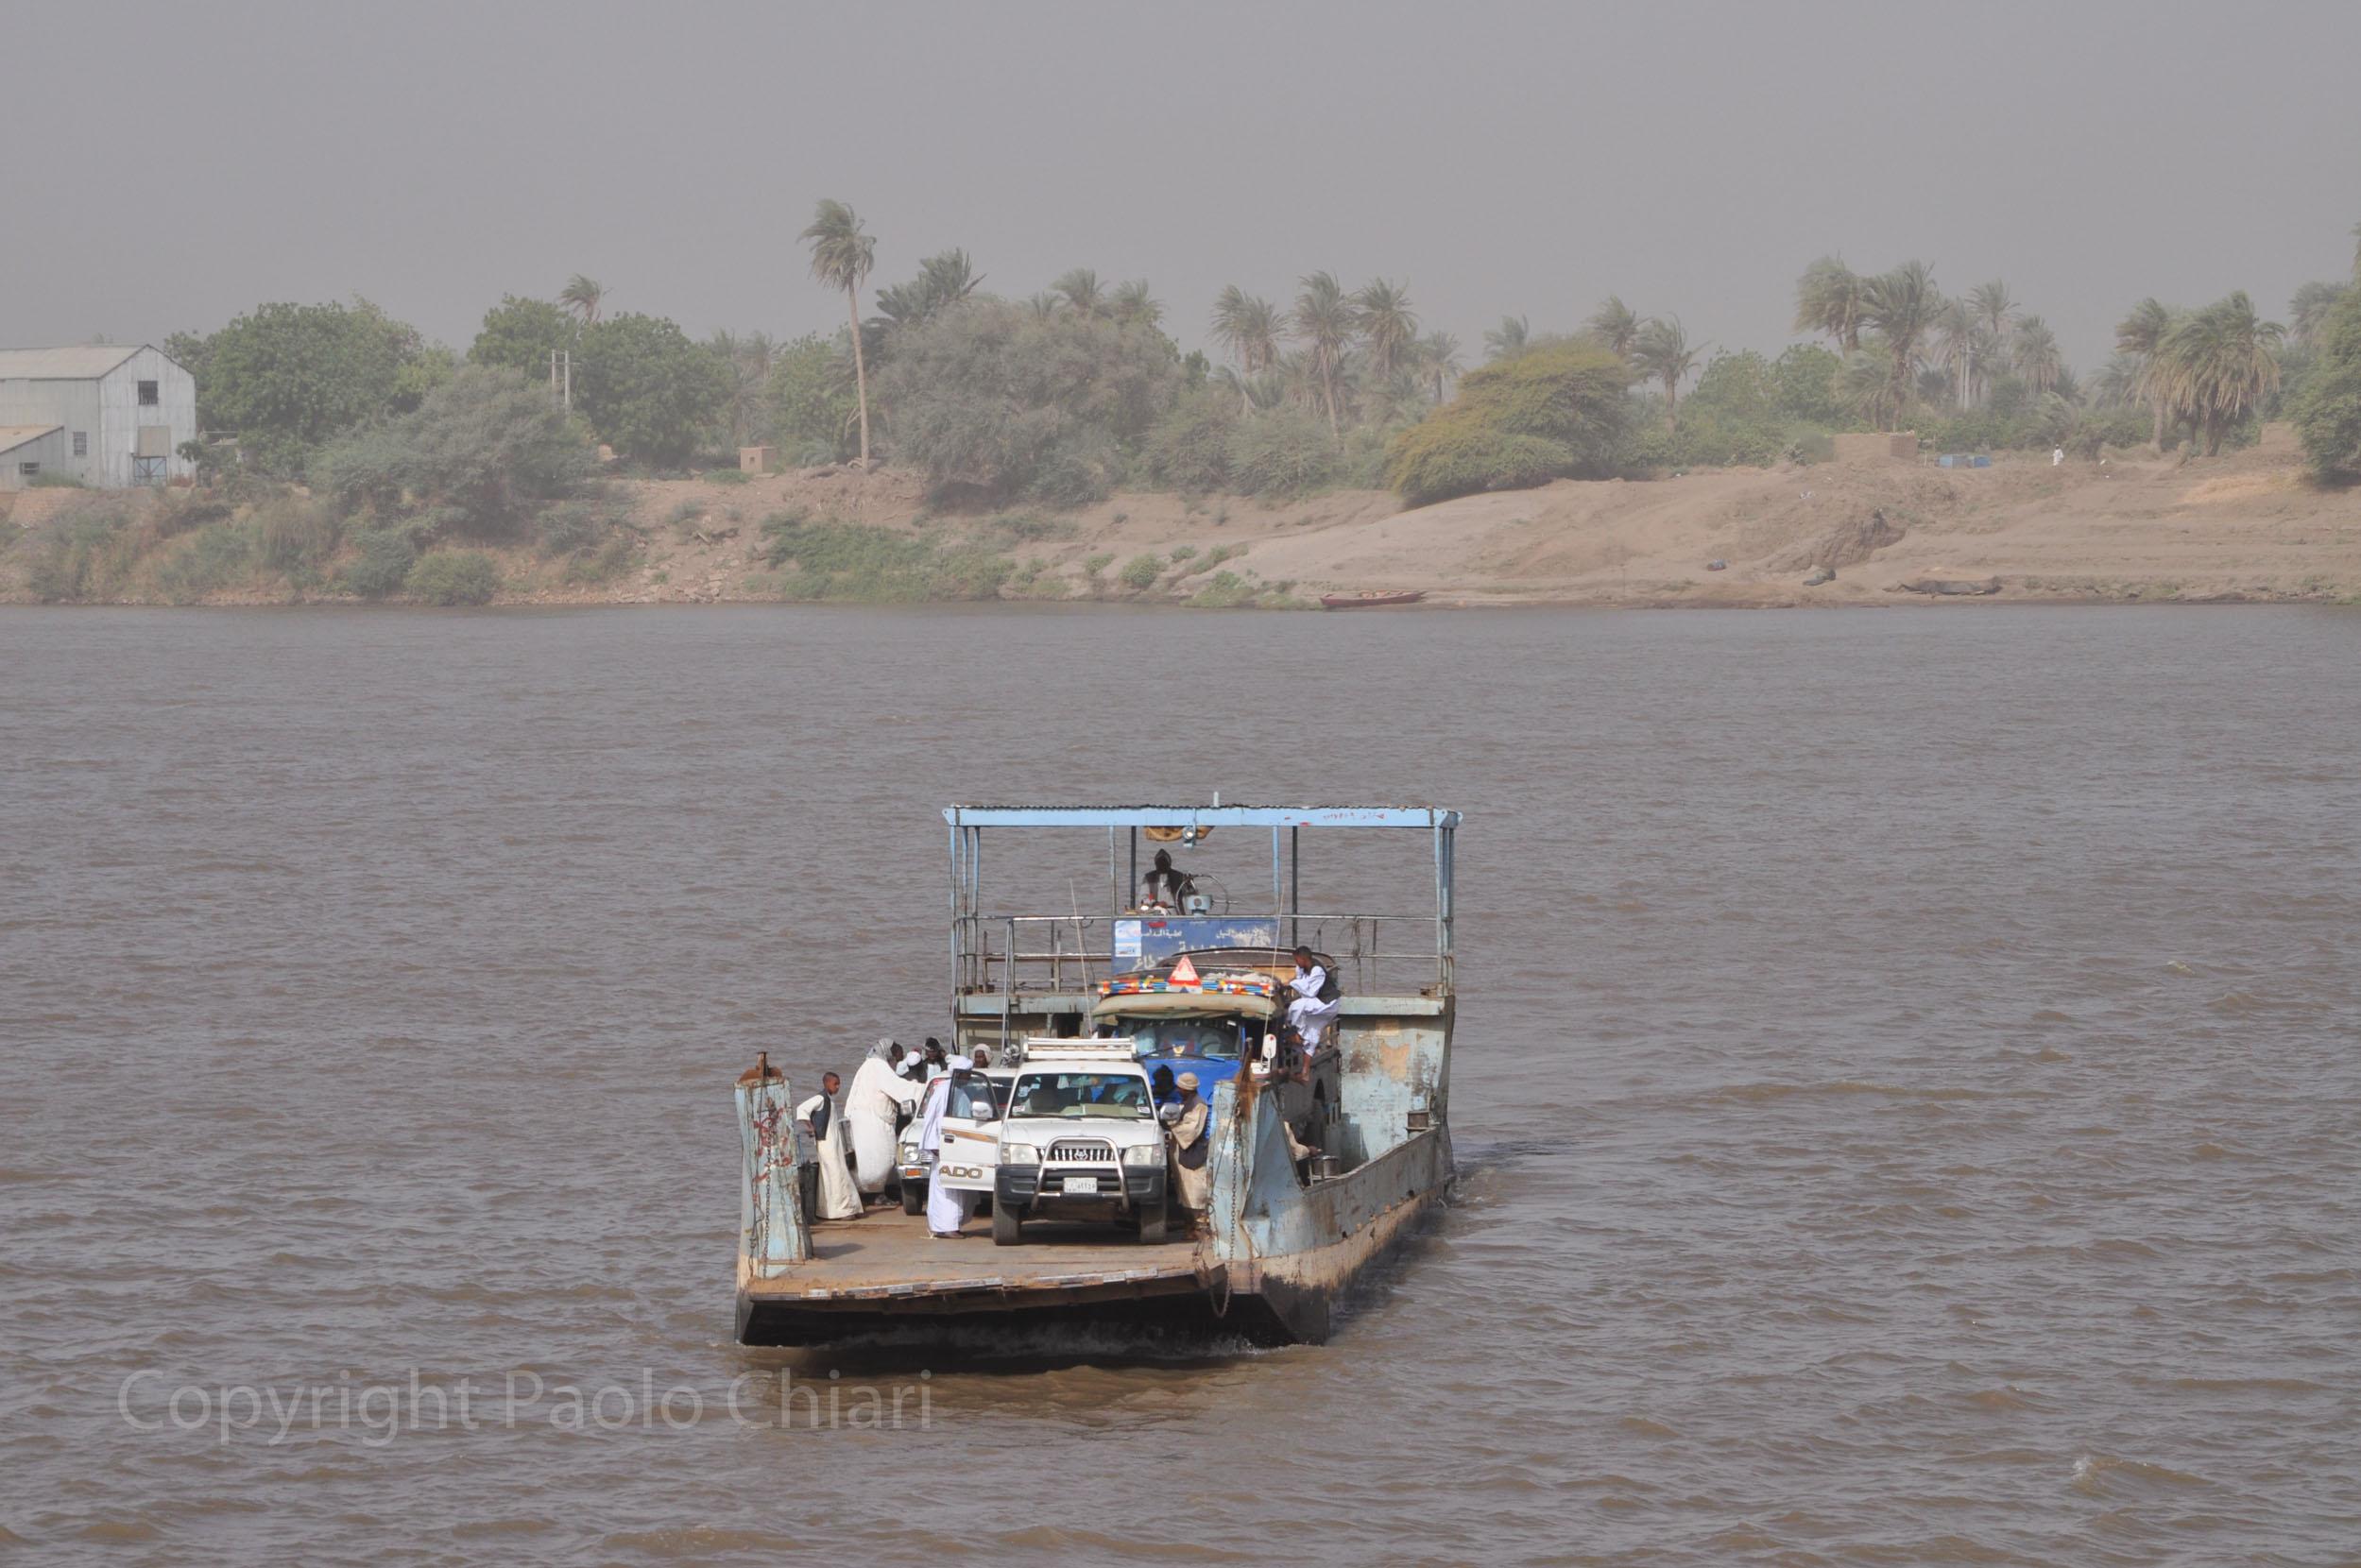 Sudan2013_0233